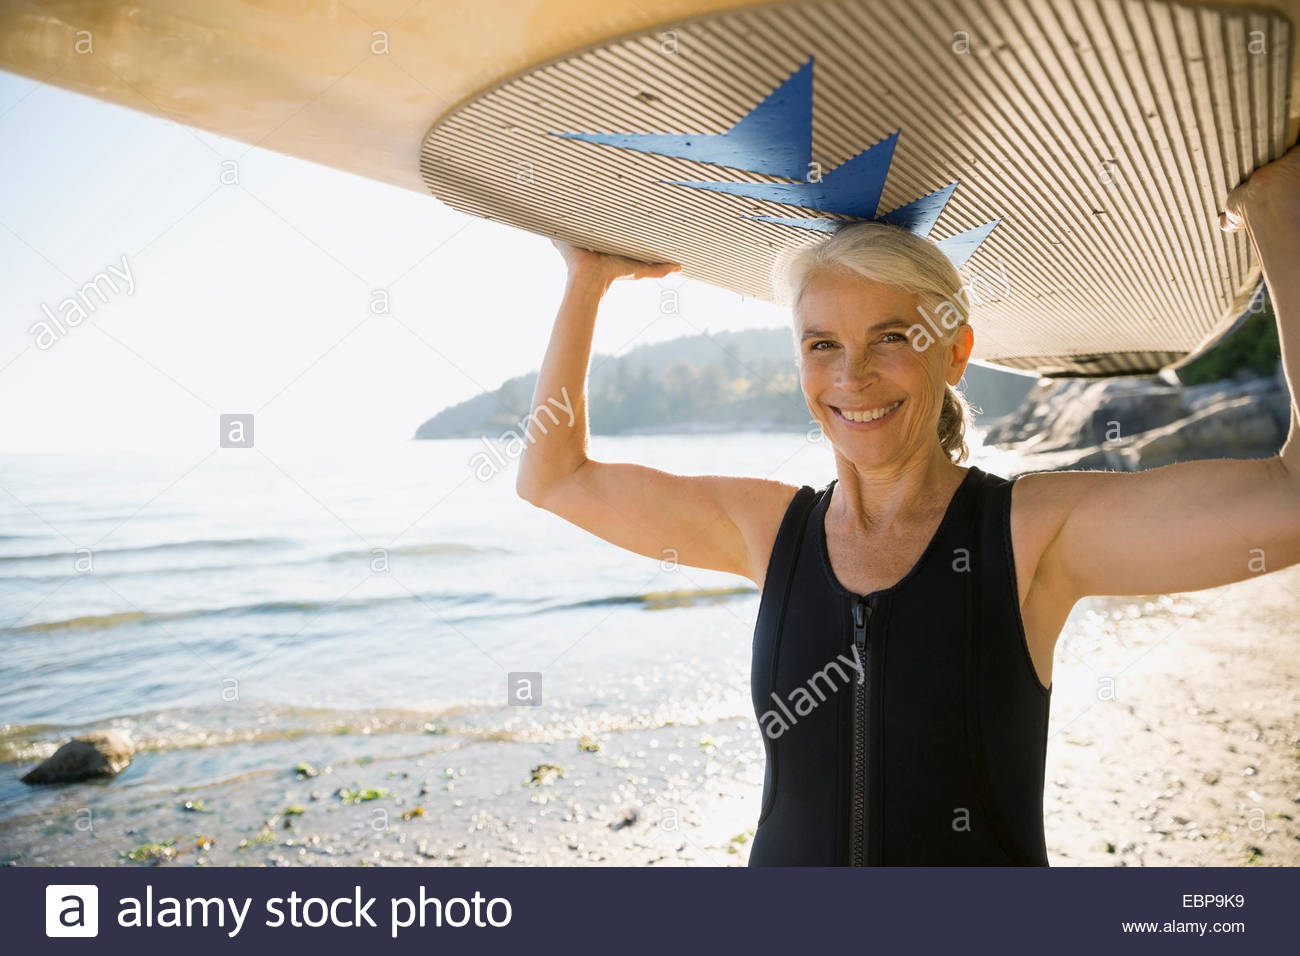 Senior woman holding paddle board overhead on beach - Stock Image